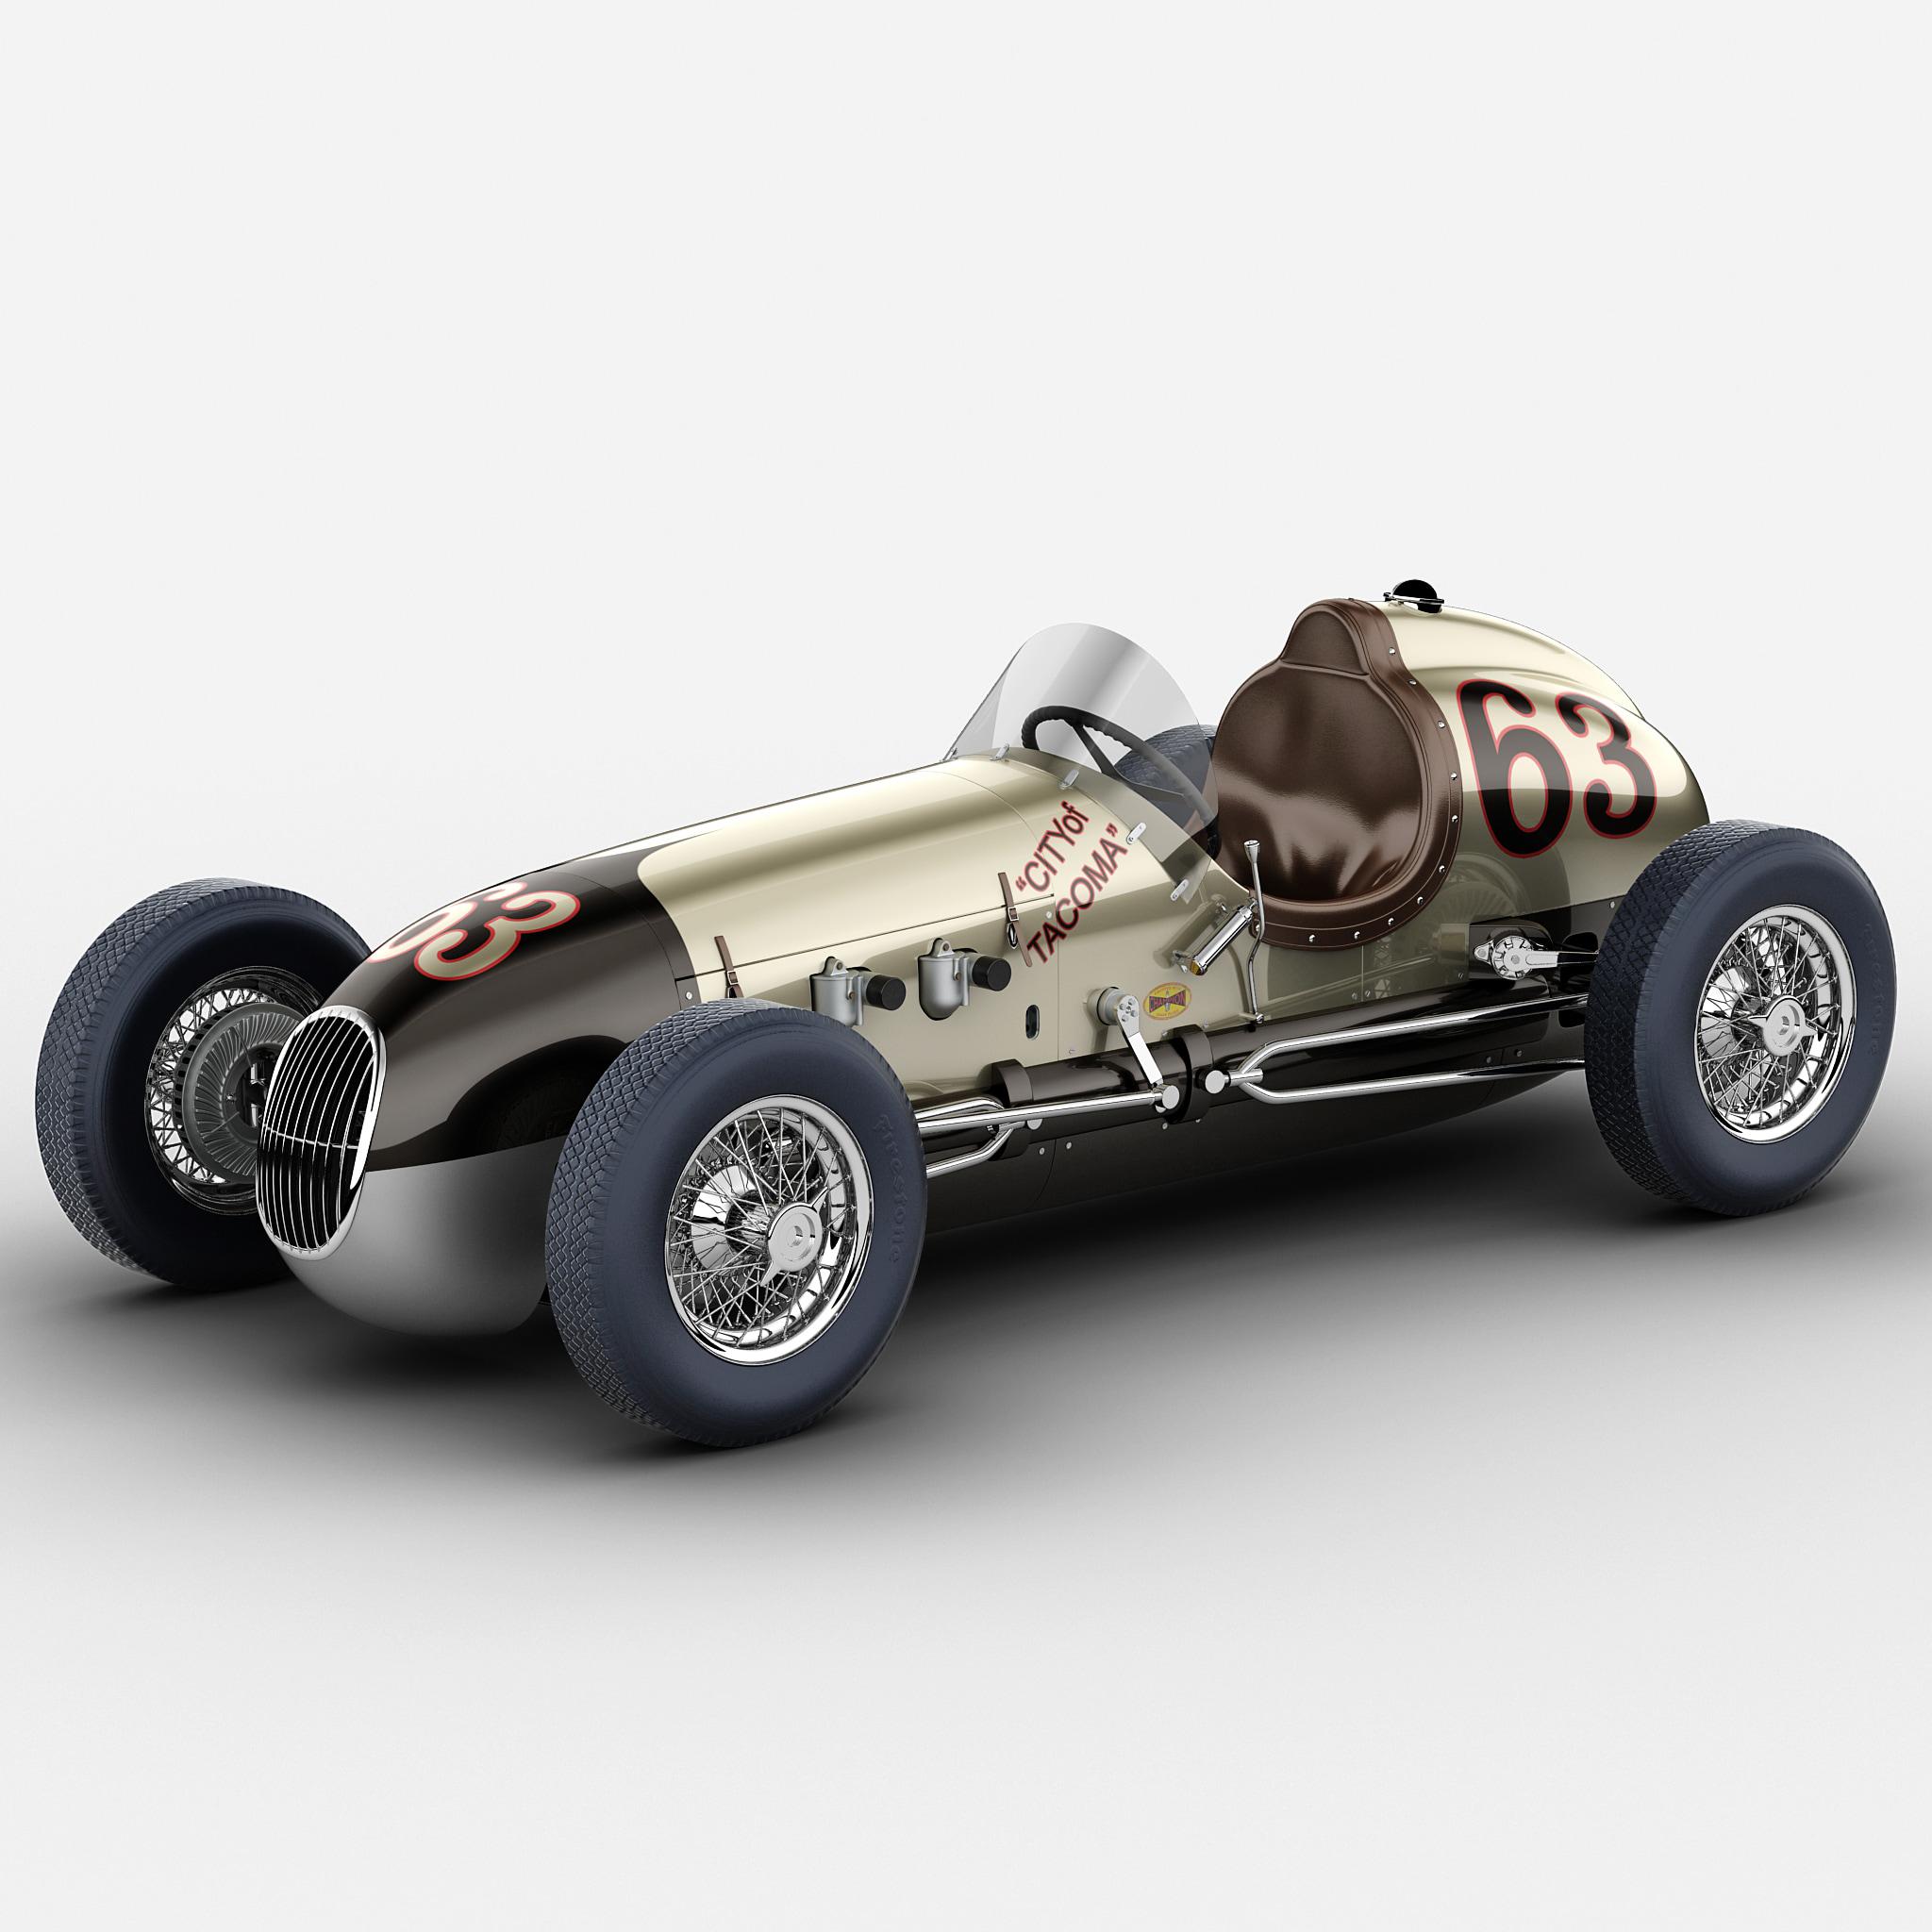 Kurtis Kraft 2000 Vintage Race Car_2.jpg